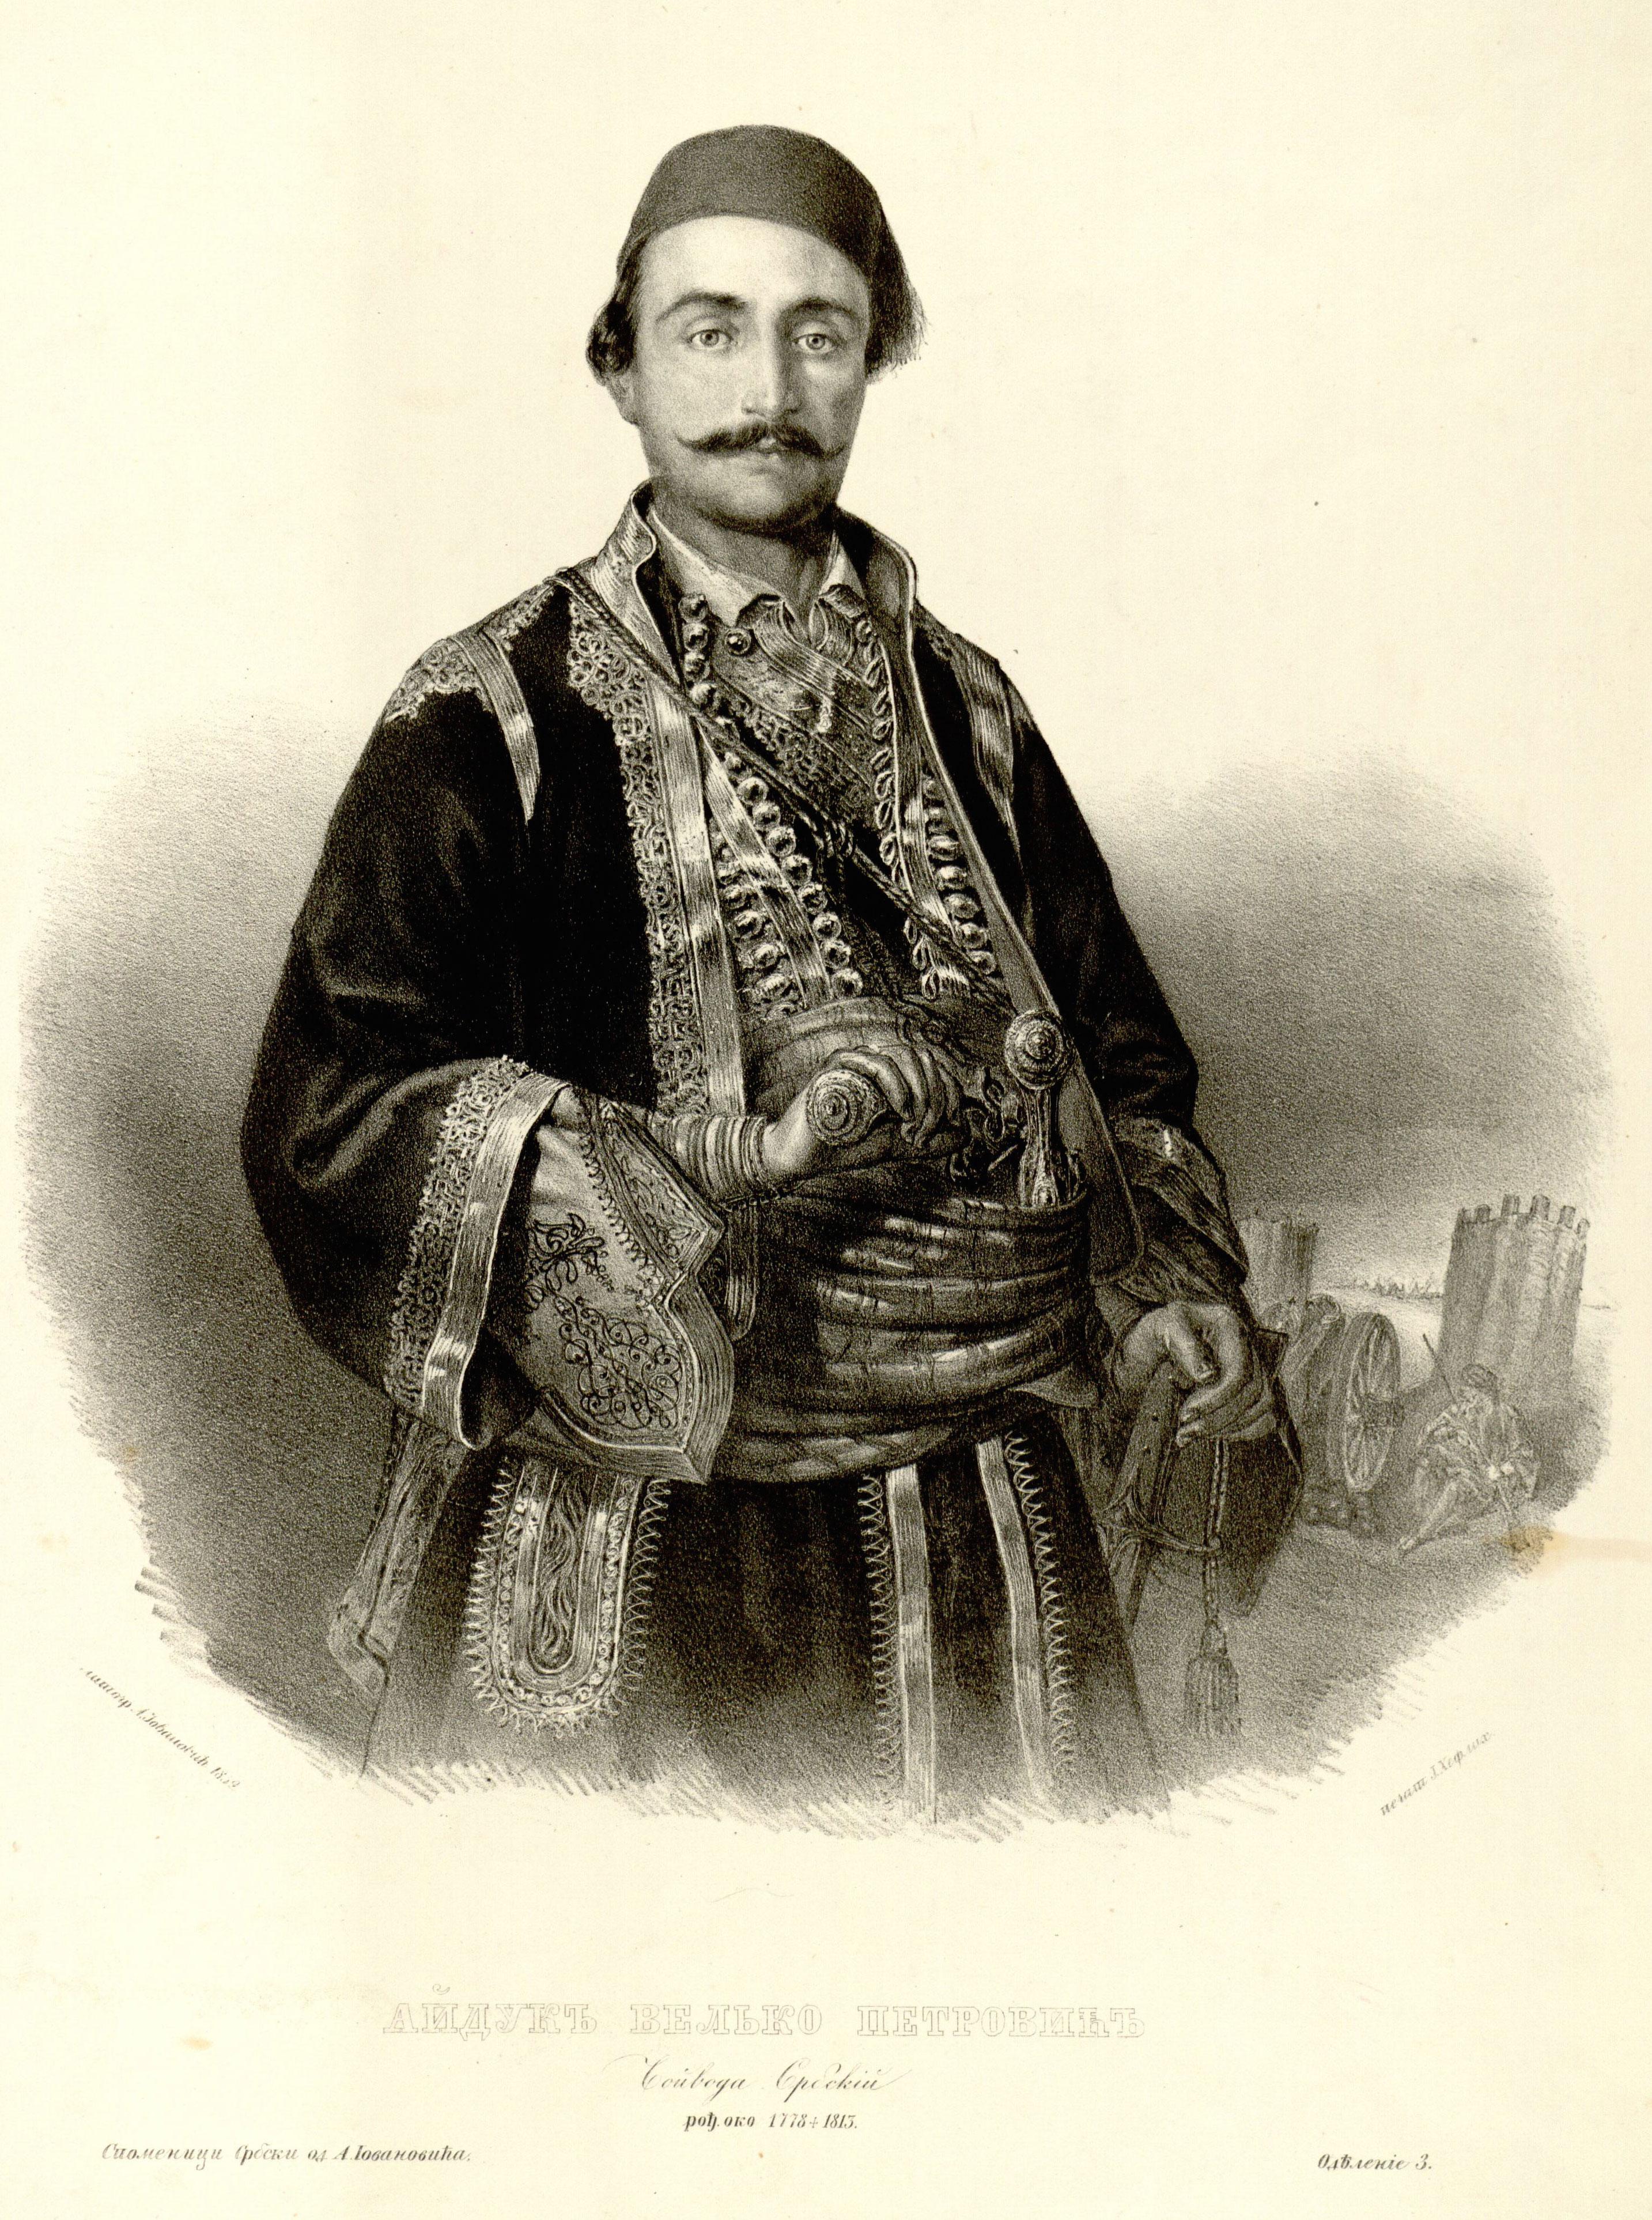 Veljko Petrovic hajduk karakter